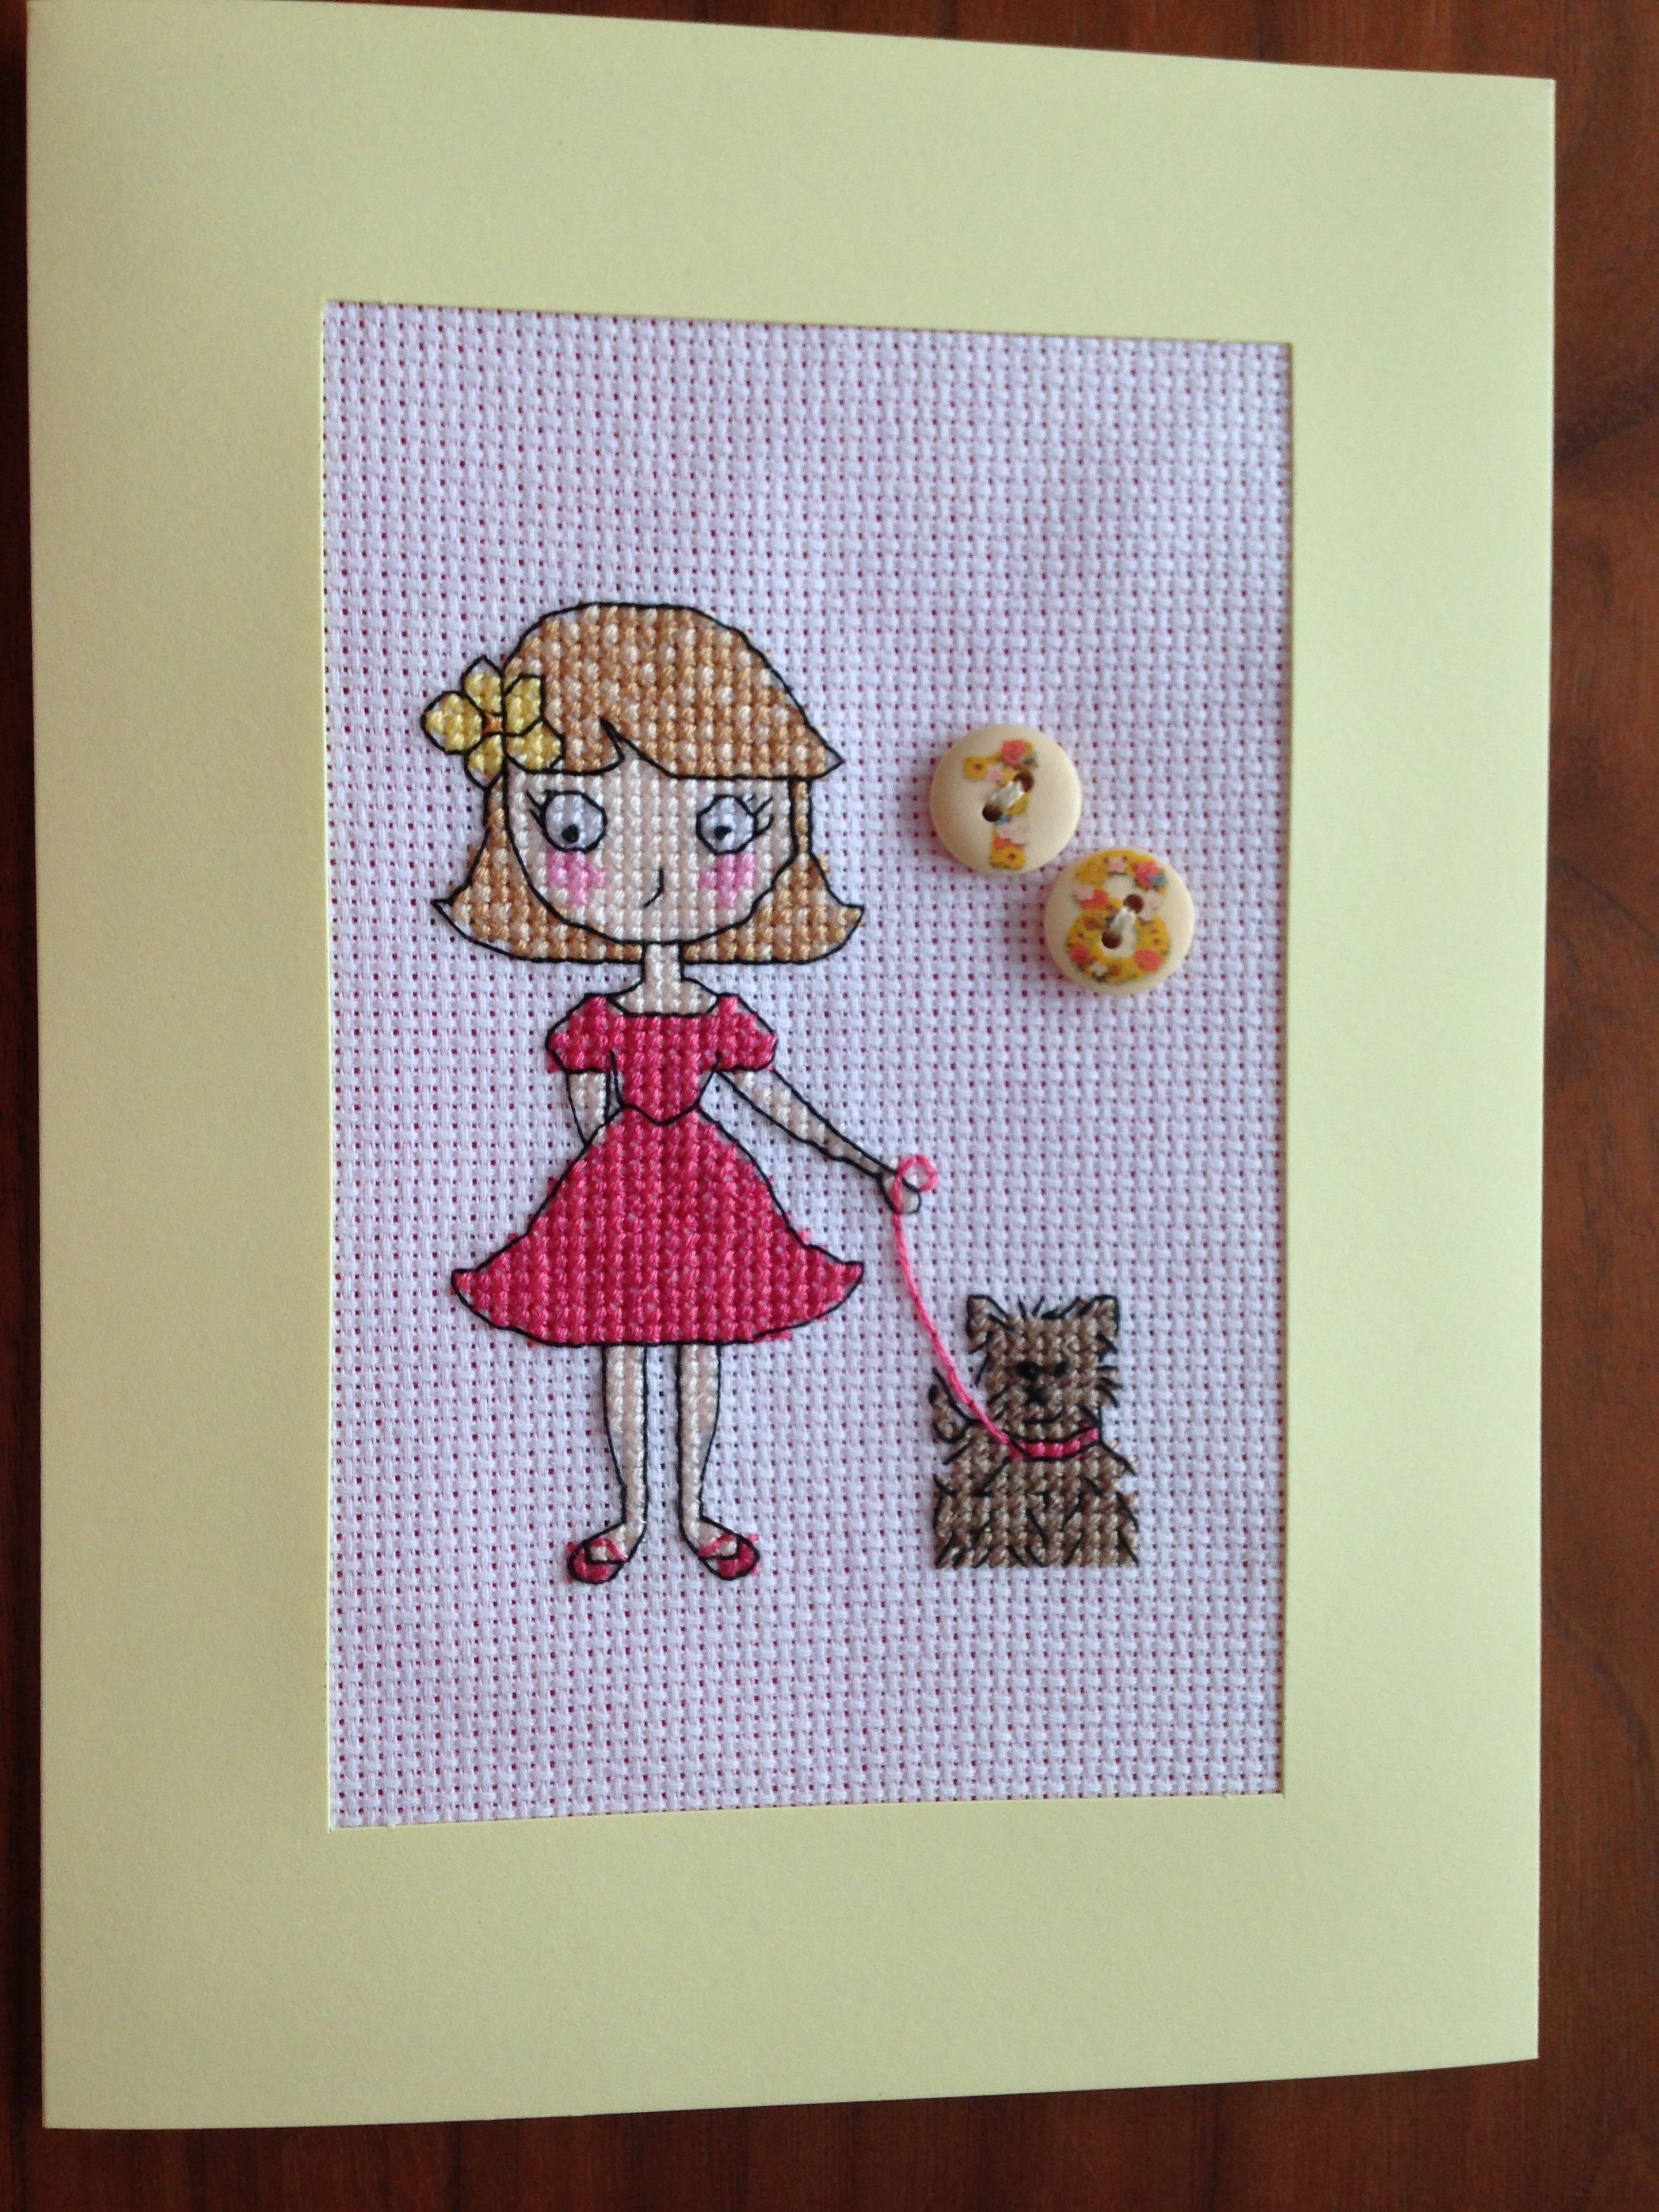 18th Birthday Card Cross Stitch Pinterest Cross Stitch And Stitch